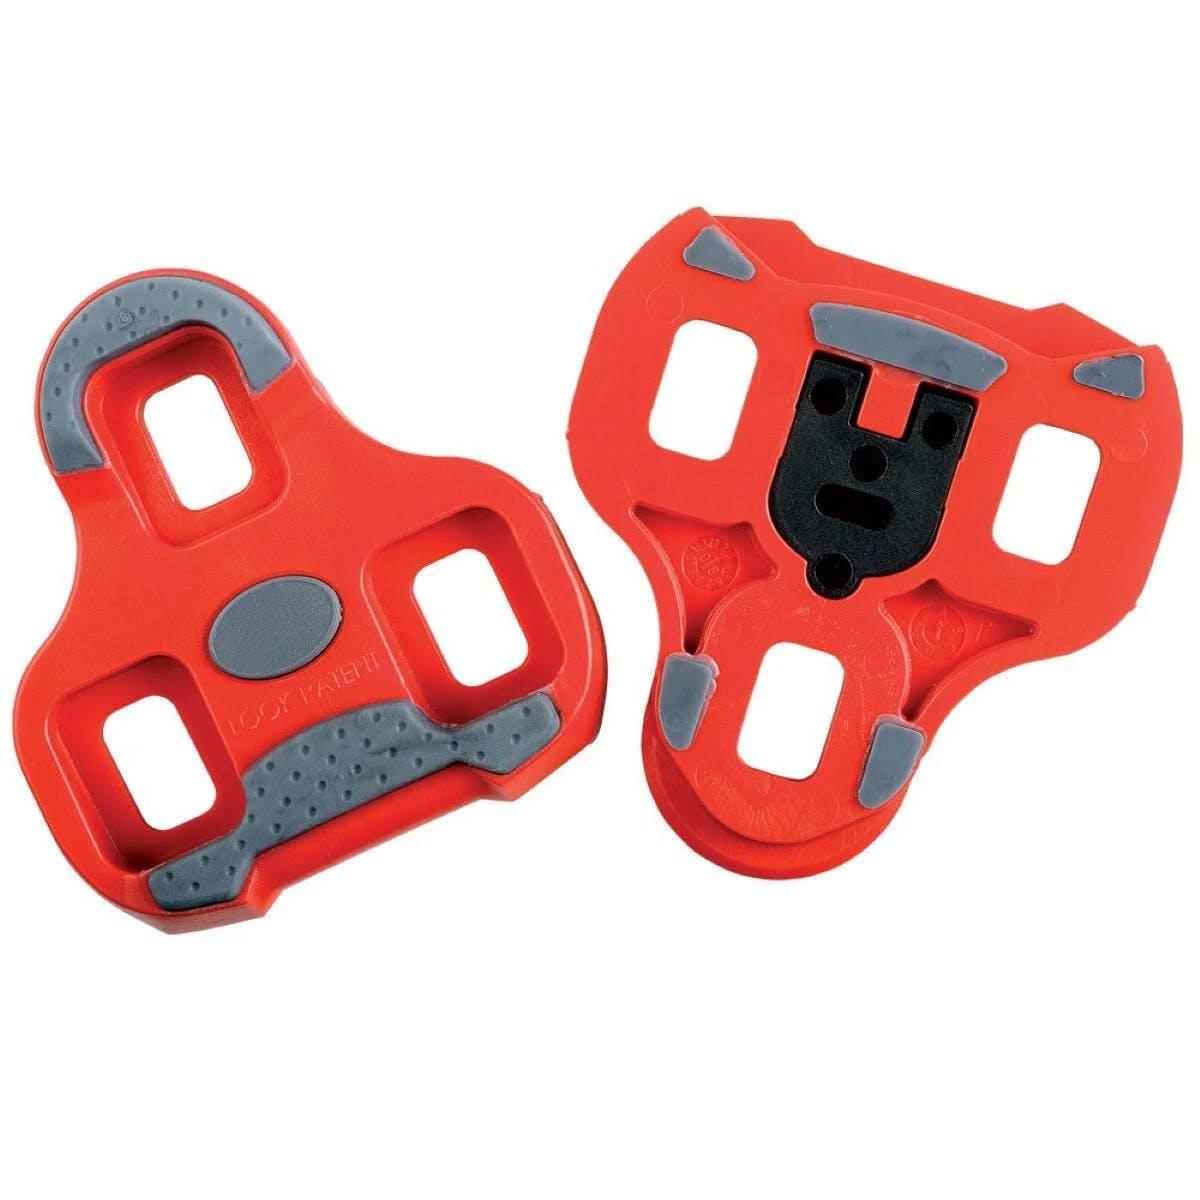 Look Keo Grip Cleats - Red